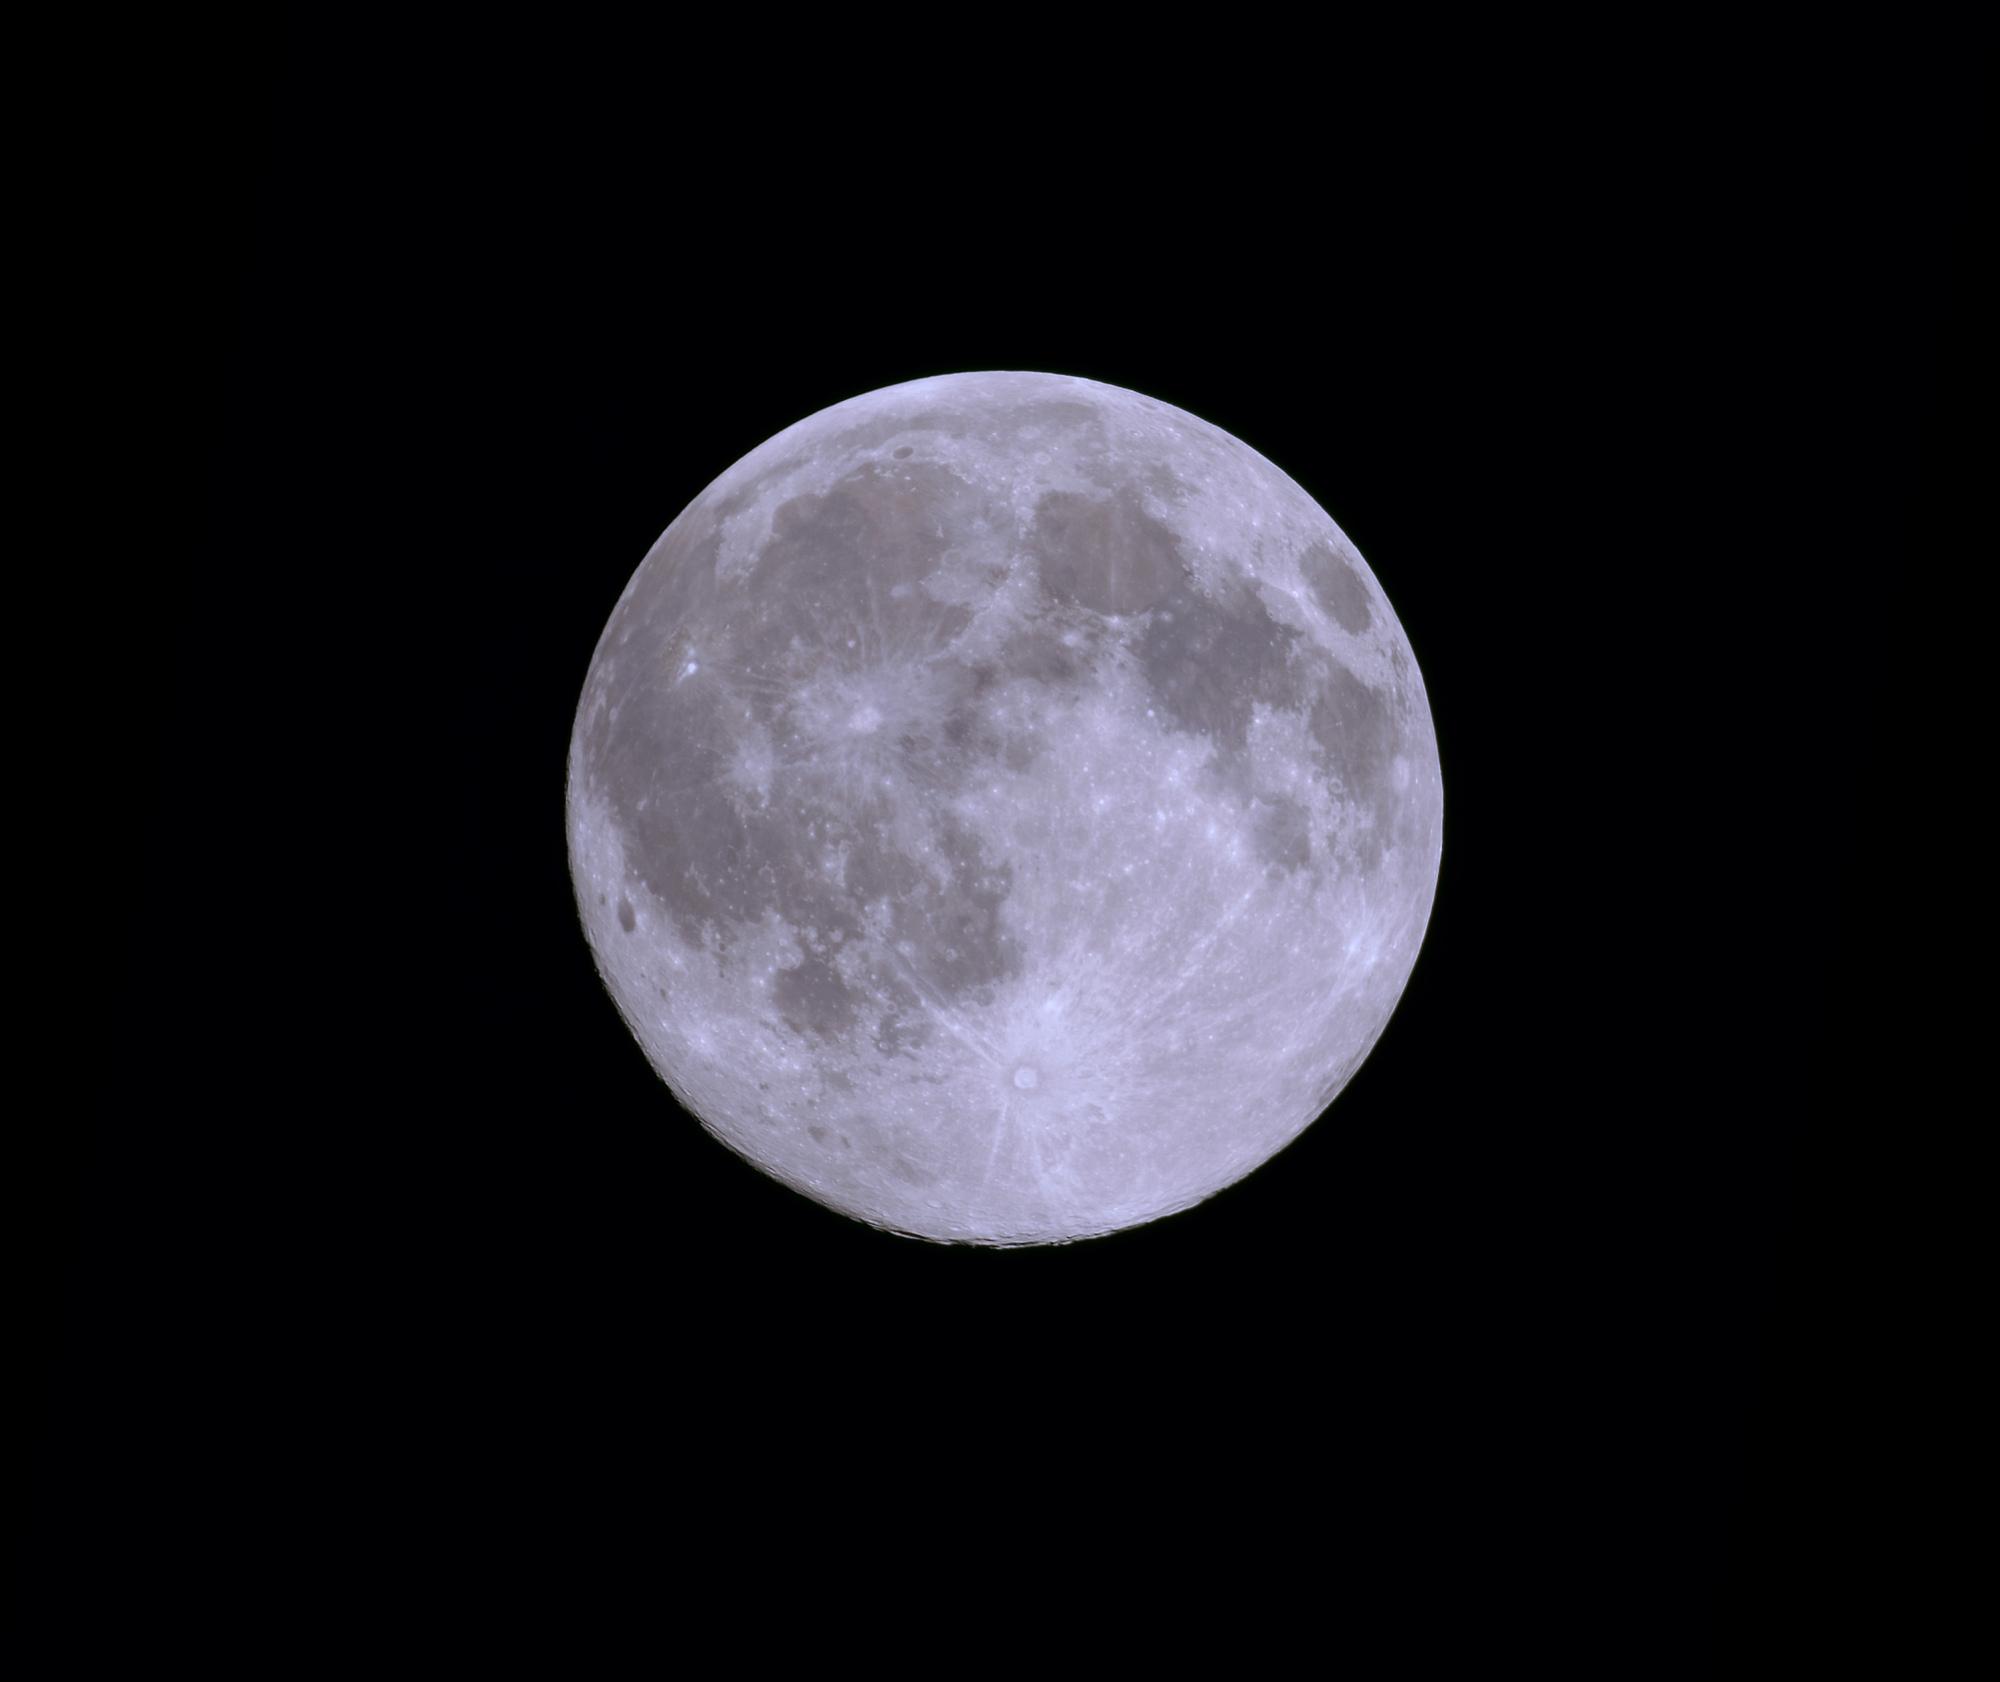 603c208630976_lune270221(T600-doubleur-100)2.thumb.jpg.82cf218930ff438ada1e4073025bb20d.jpg